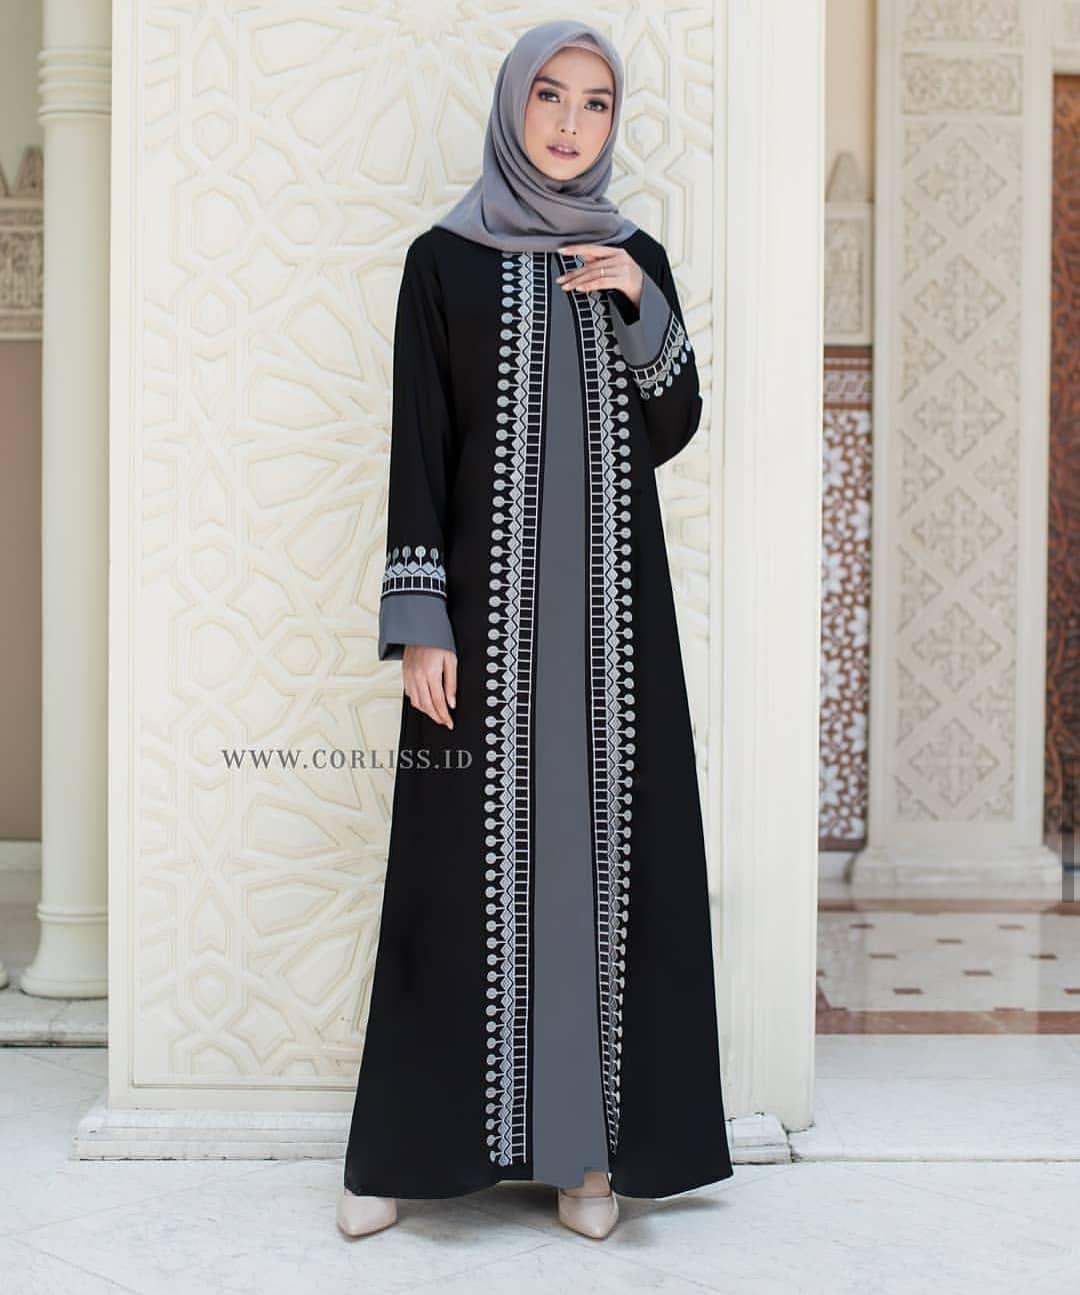 Gamis Abaya Gamis Abaya Arab Hitam Gamis Abaya Turkey Long Dress Wanita Long Dress Wanita Terbaru Gamis Syari Gamis Wanita Busana Muslim Wanita Terbaru